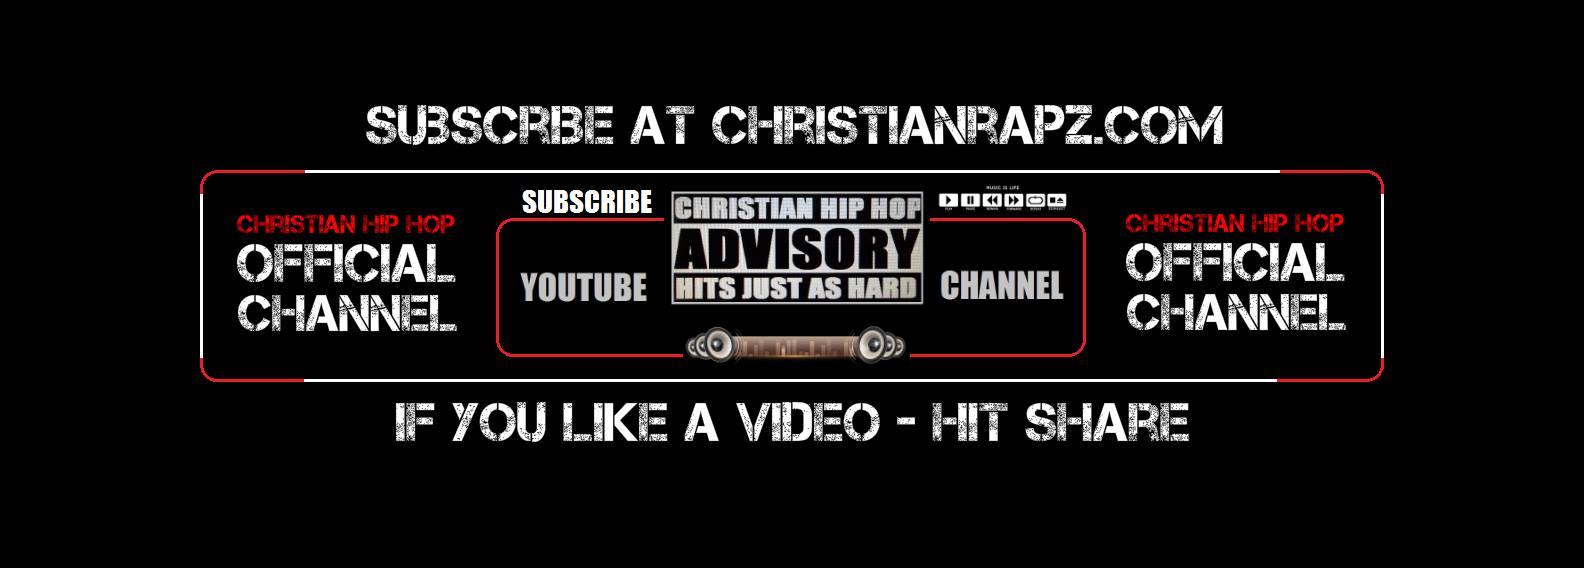 Christian Hip Hop Hits Just as Hard